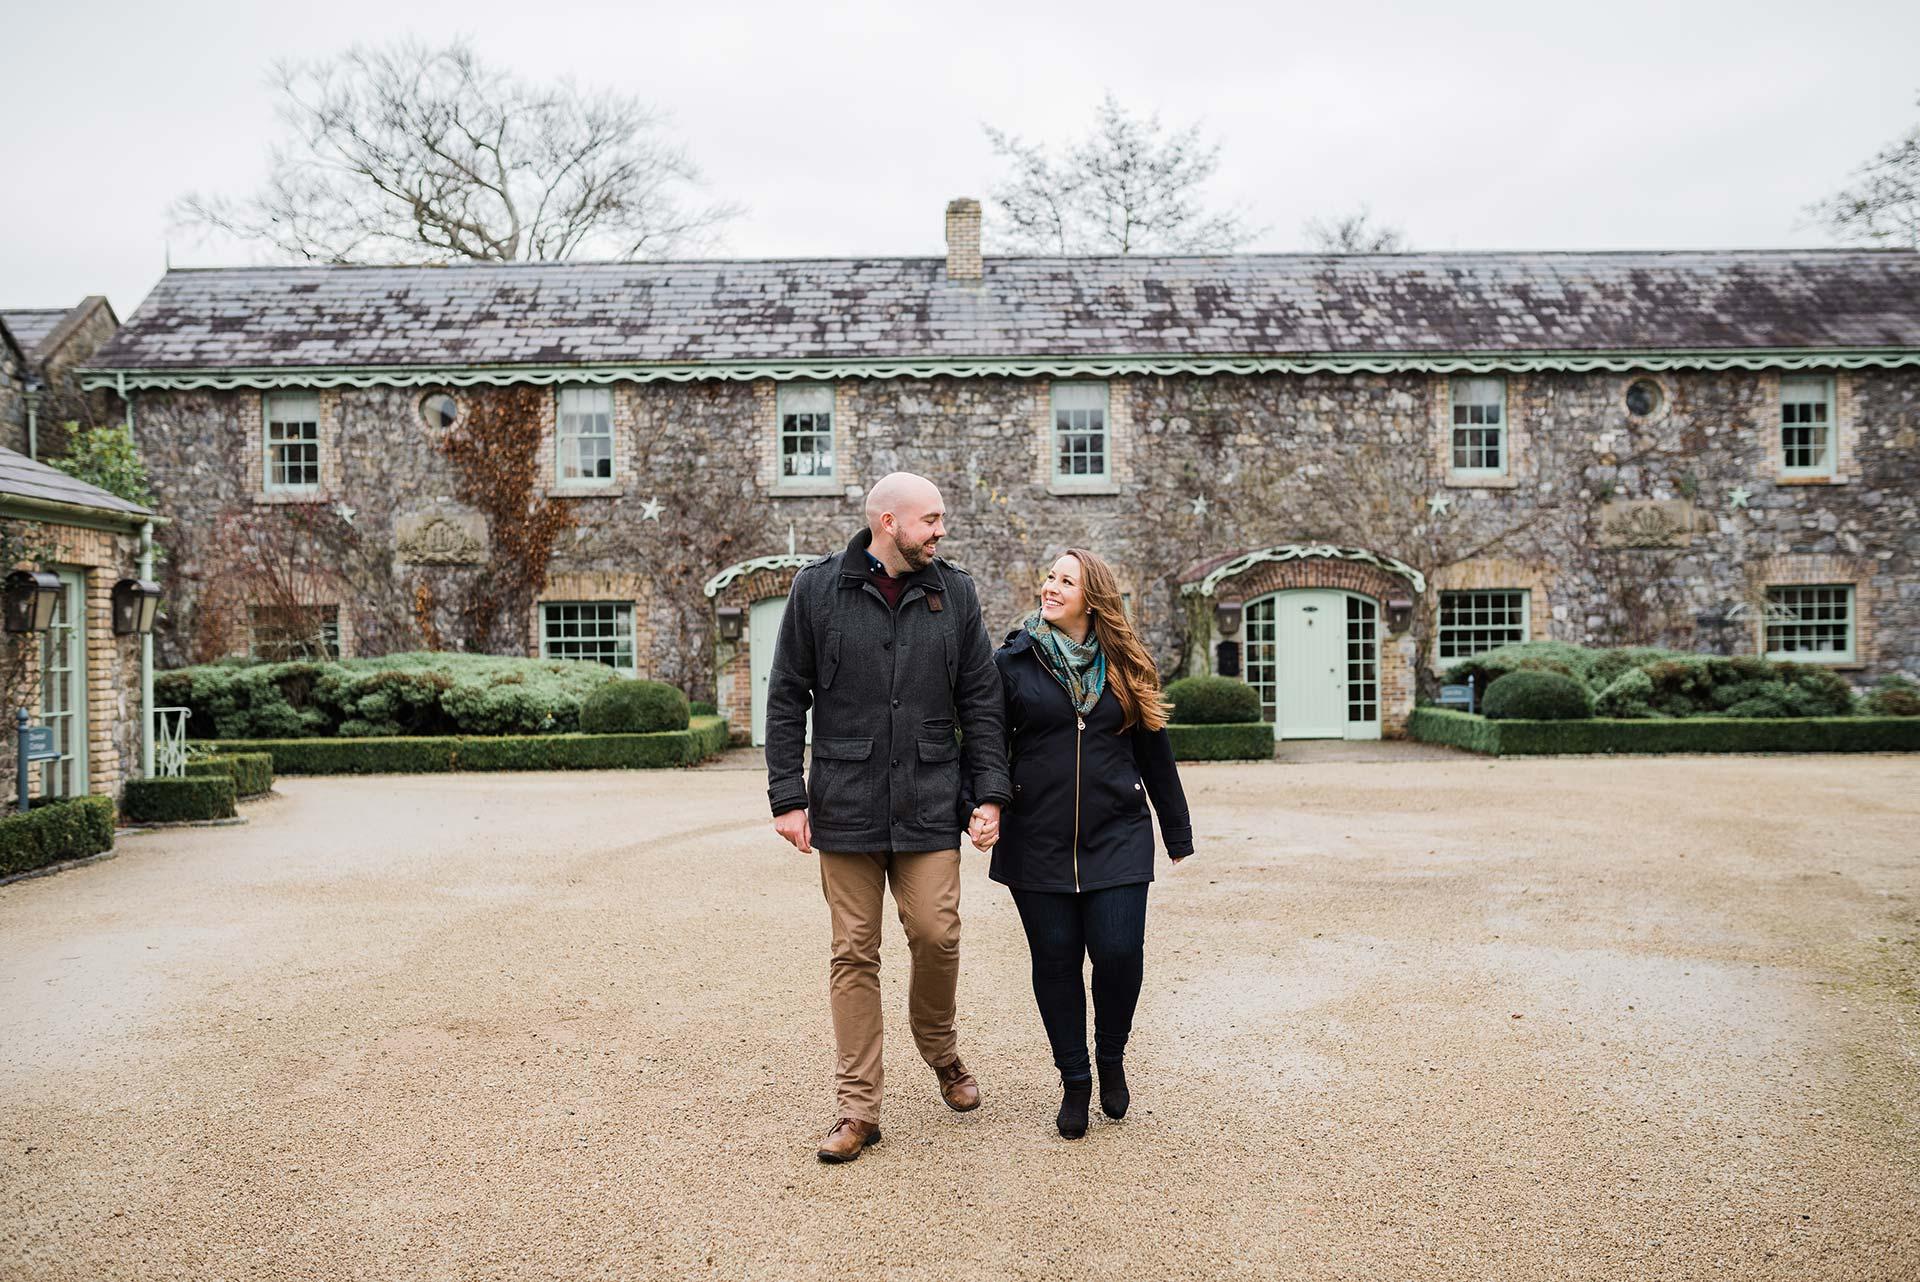 man and woman walk hand in hand away from luxury Irish countryside home